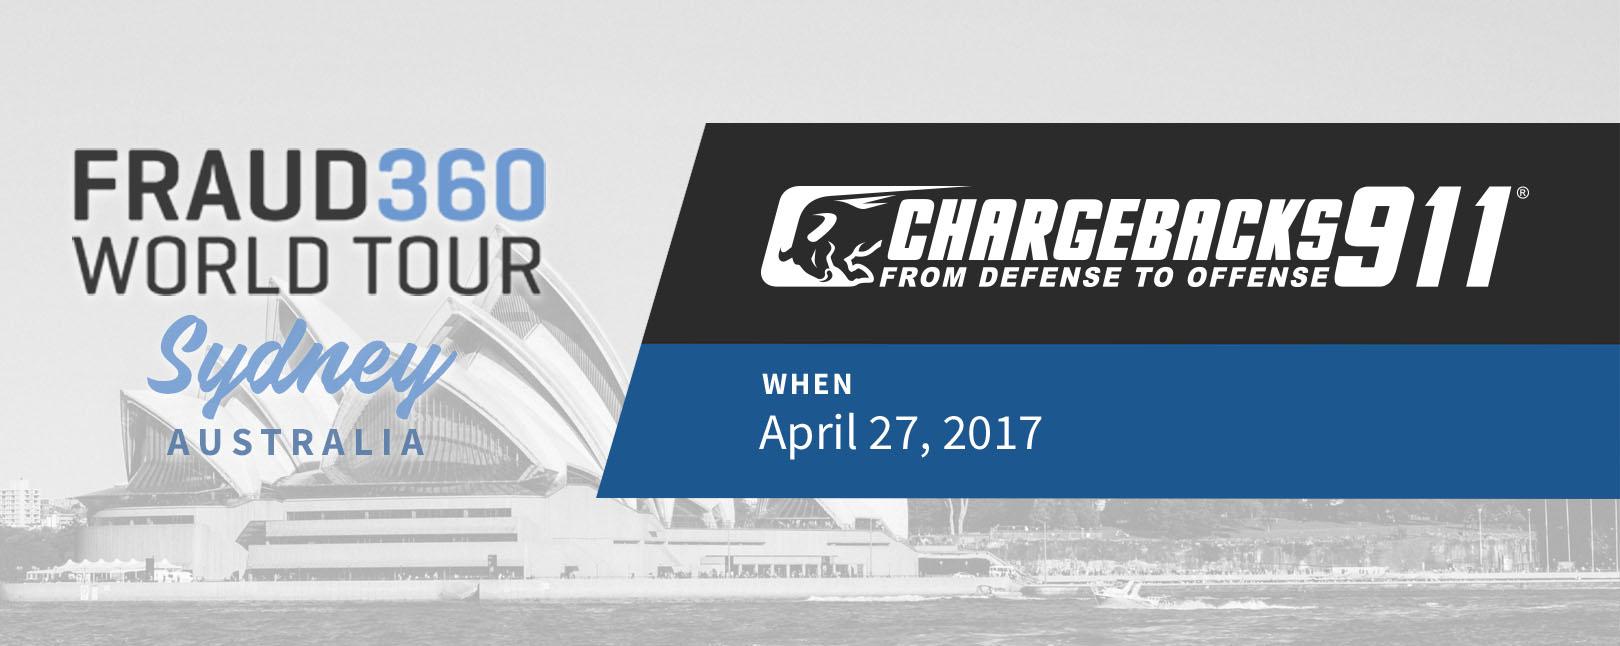 Chargebacks911 at Fraud360 World Tour - Sydney